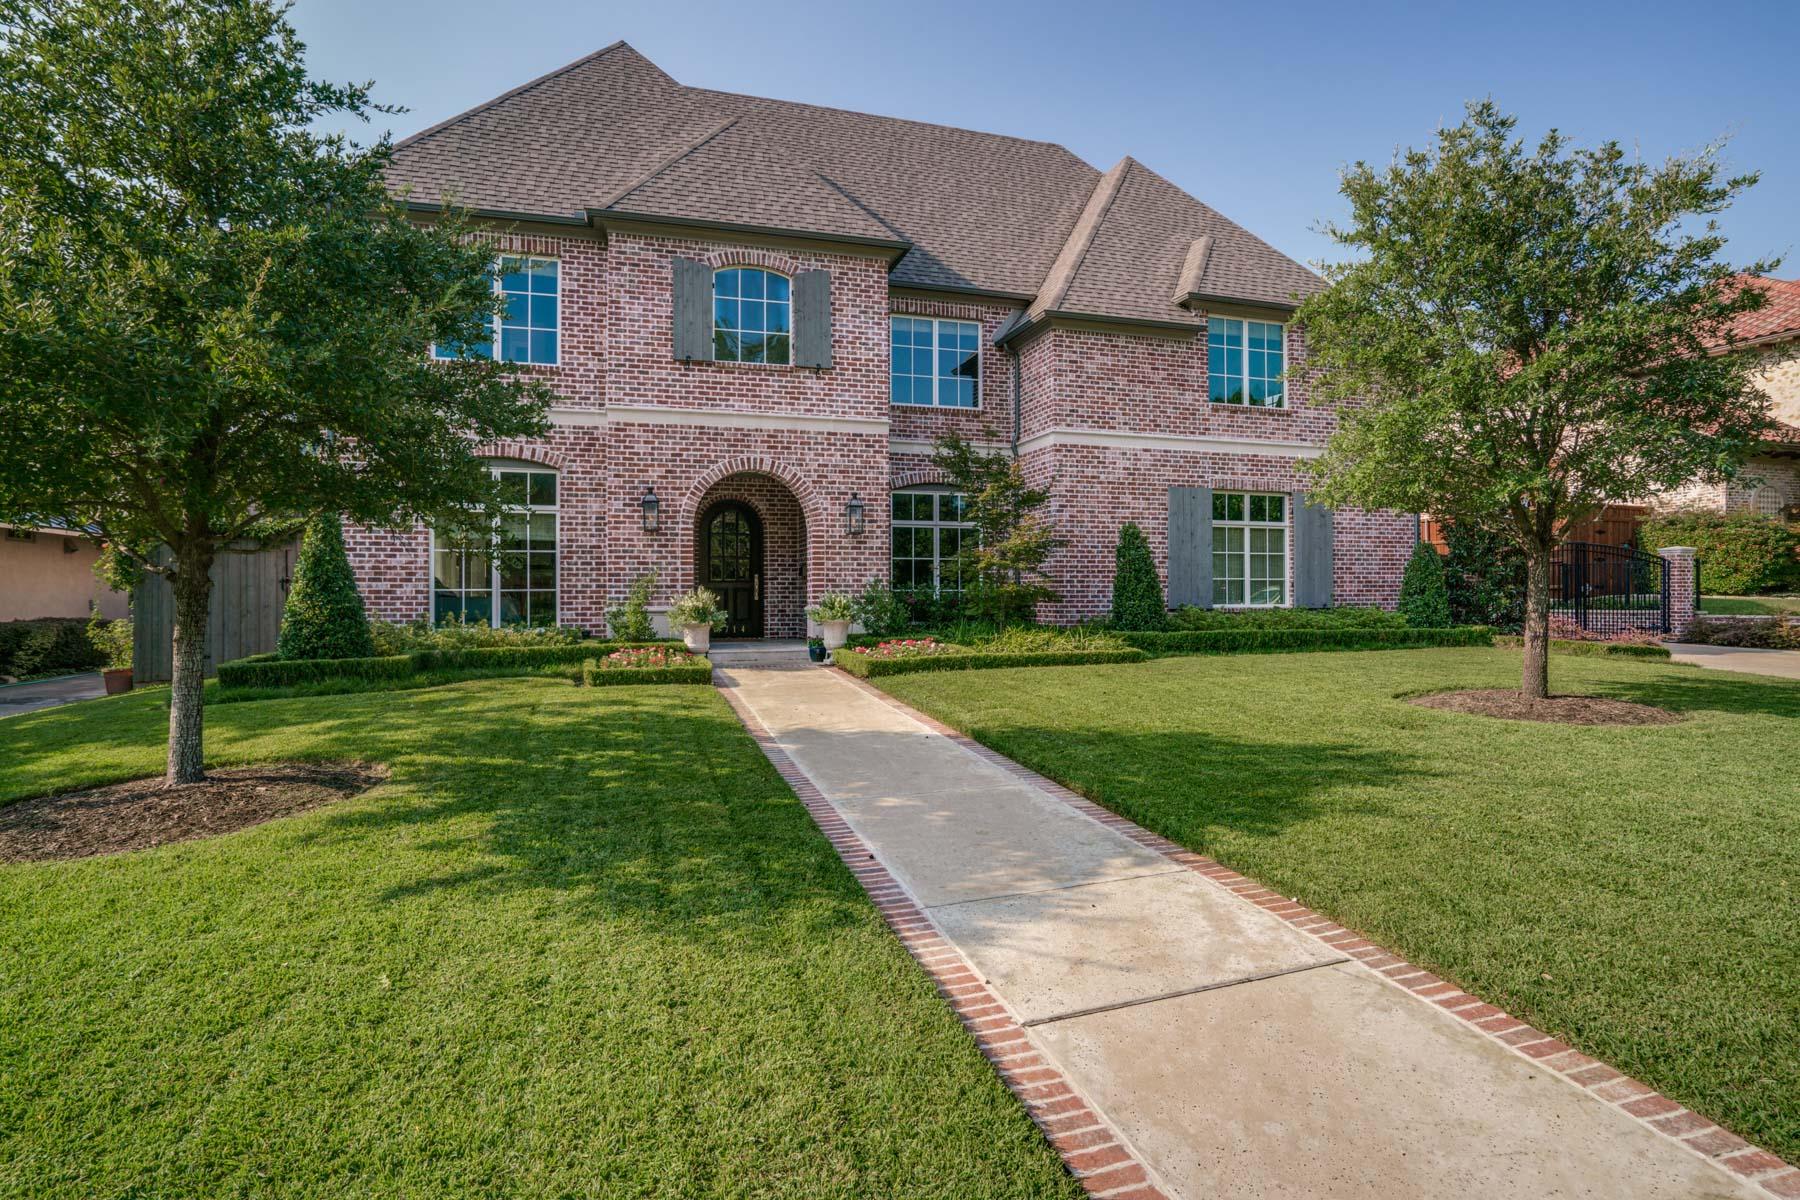 獨棟家庭住宅 為 出售 在 6714 Northport Drive, Dallas Dallas, 德克薩斯州, 75230 美國